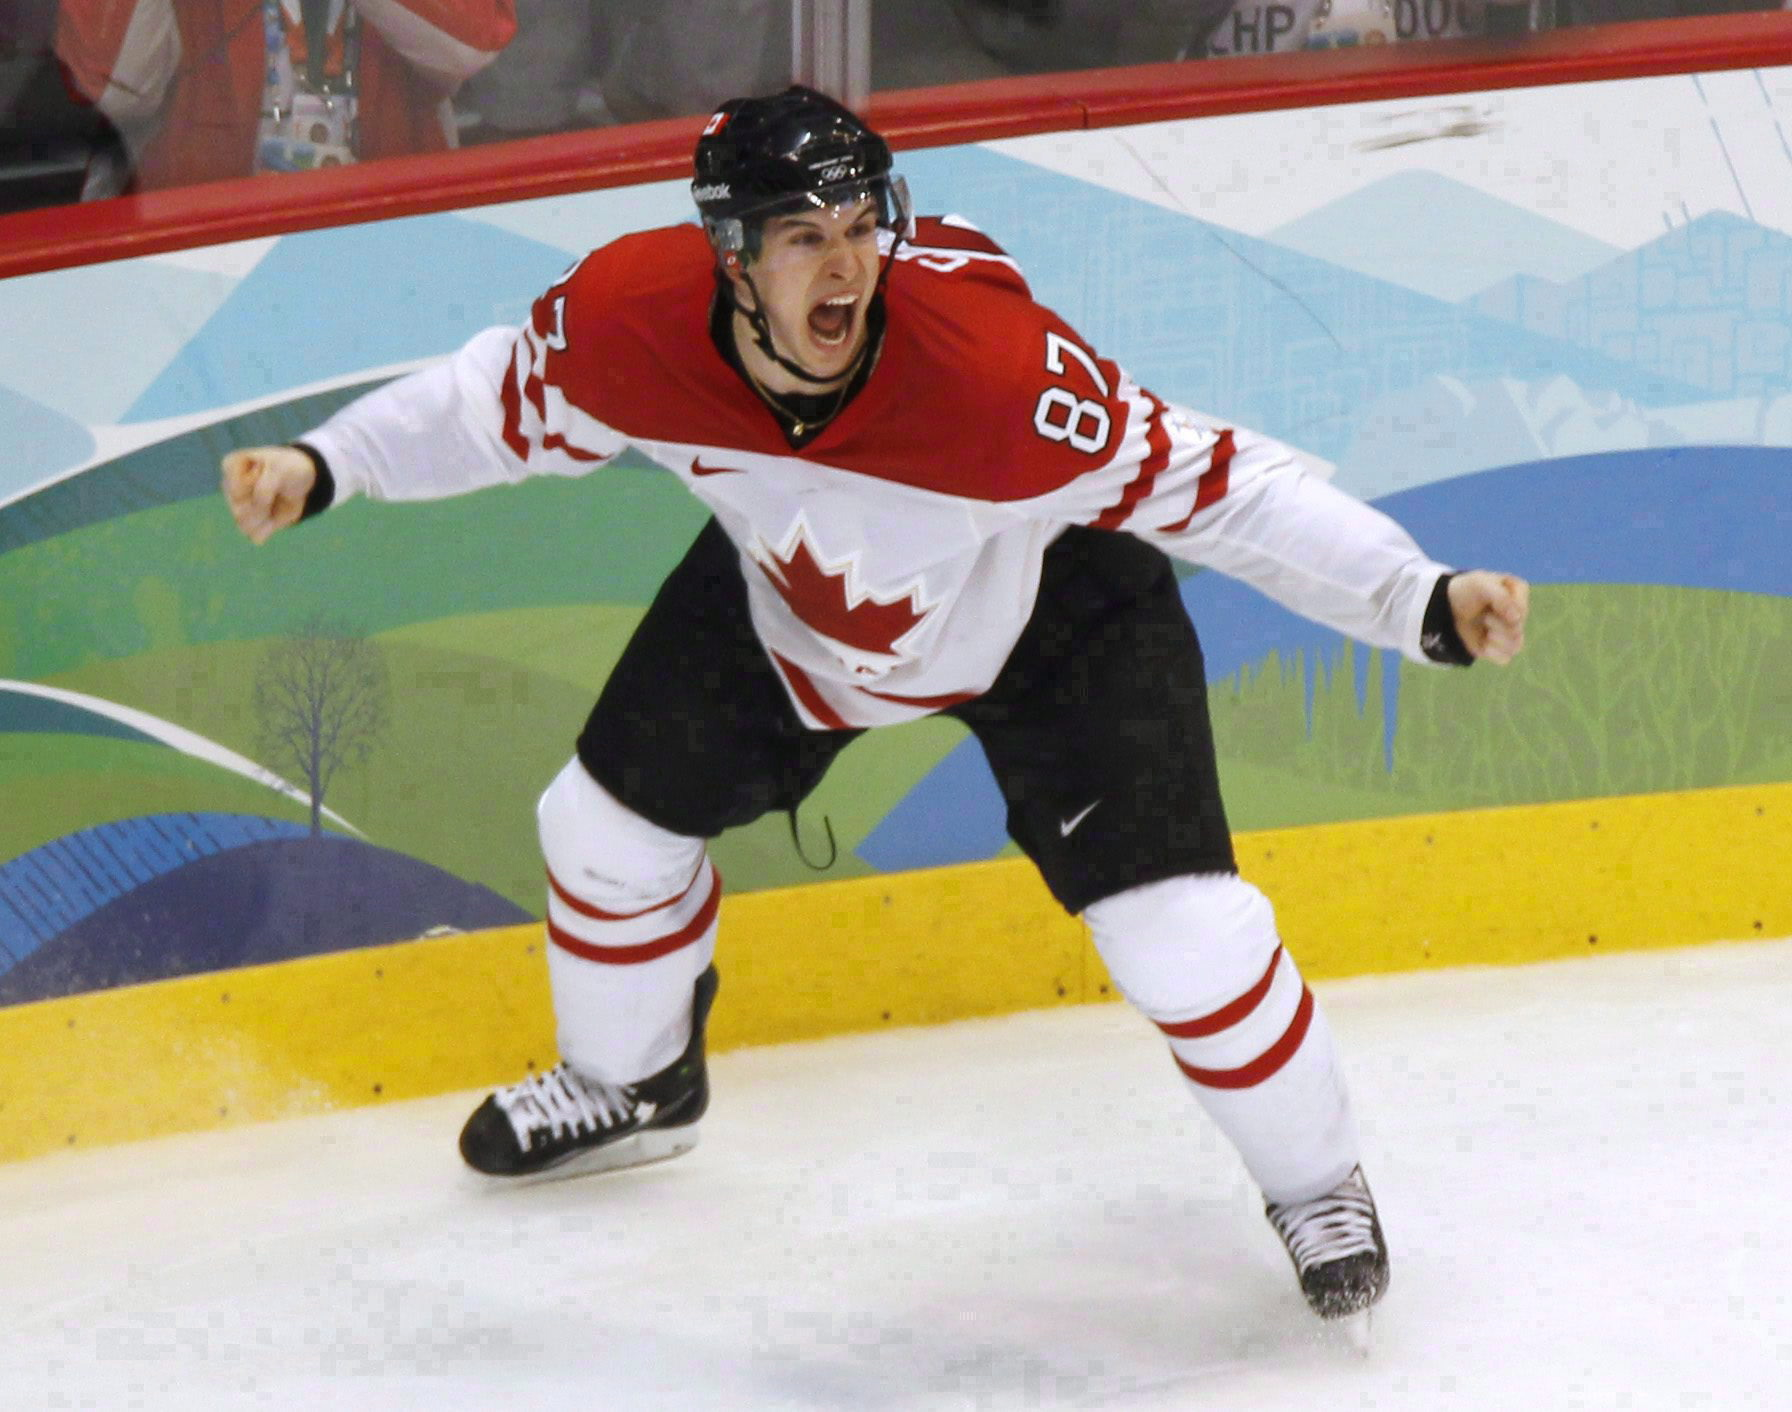 Sidney Crosby celebrating